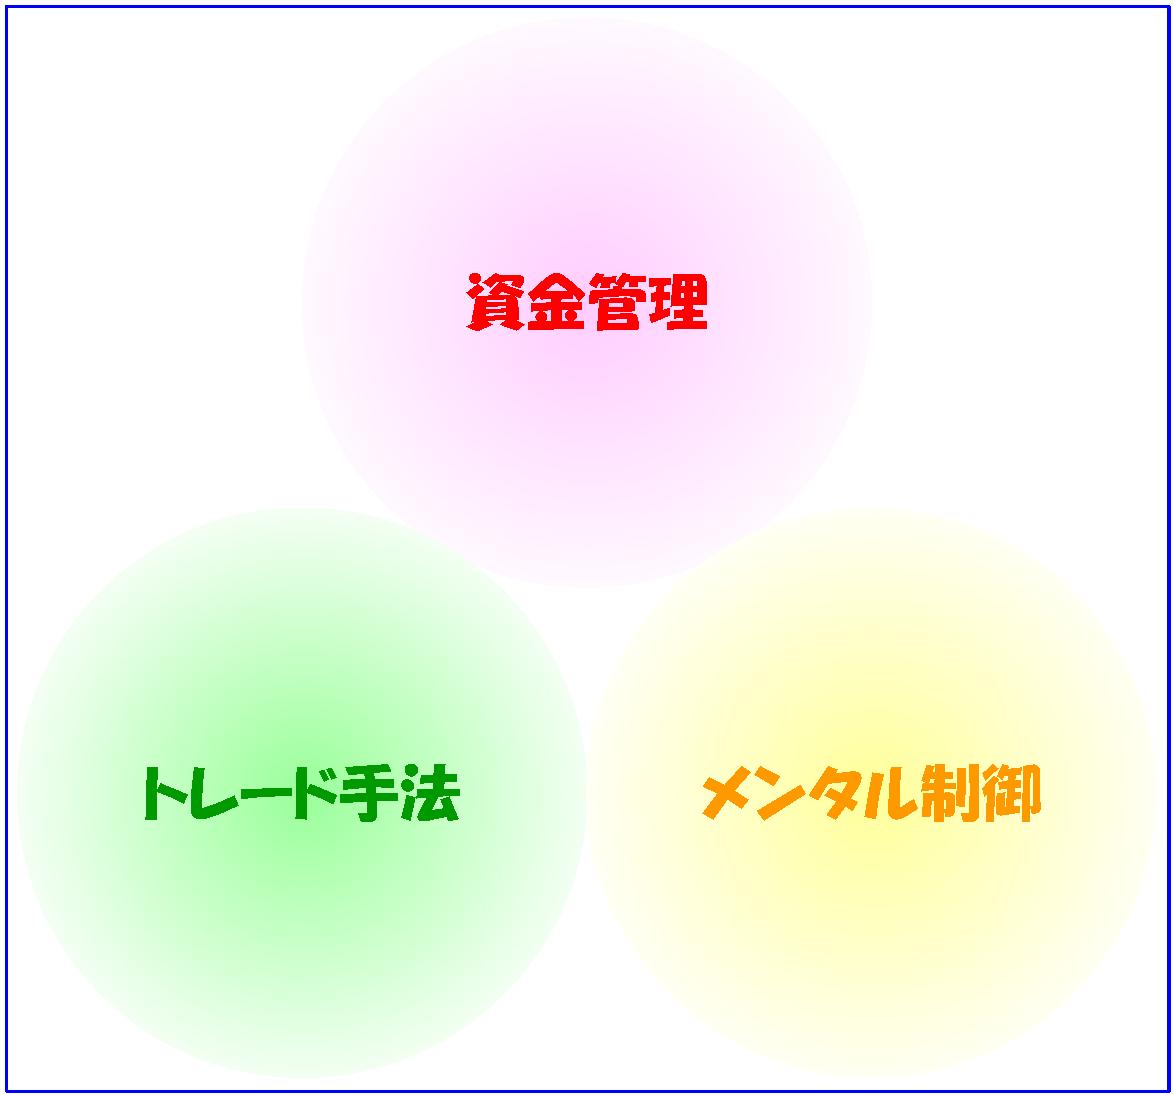 20150423_3p0